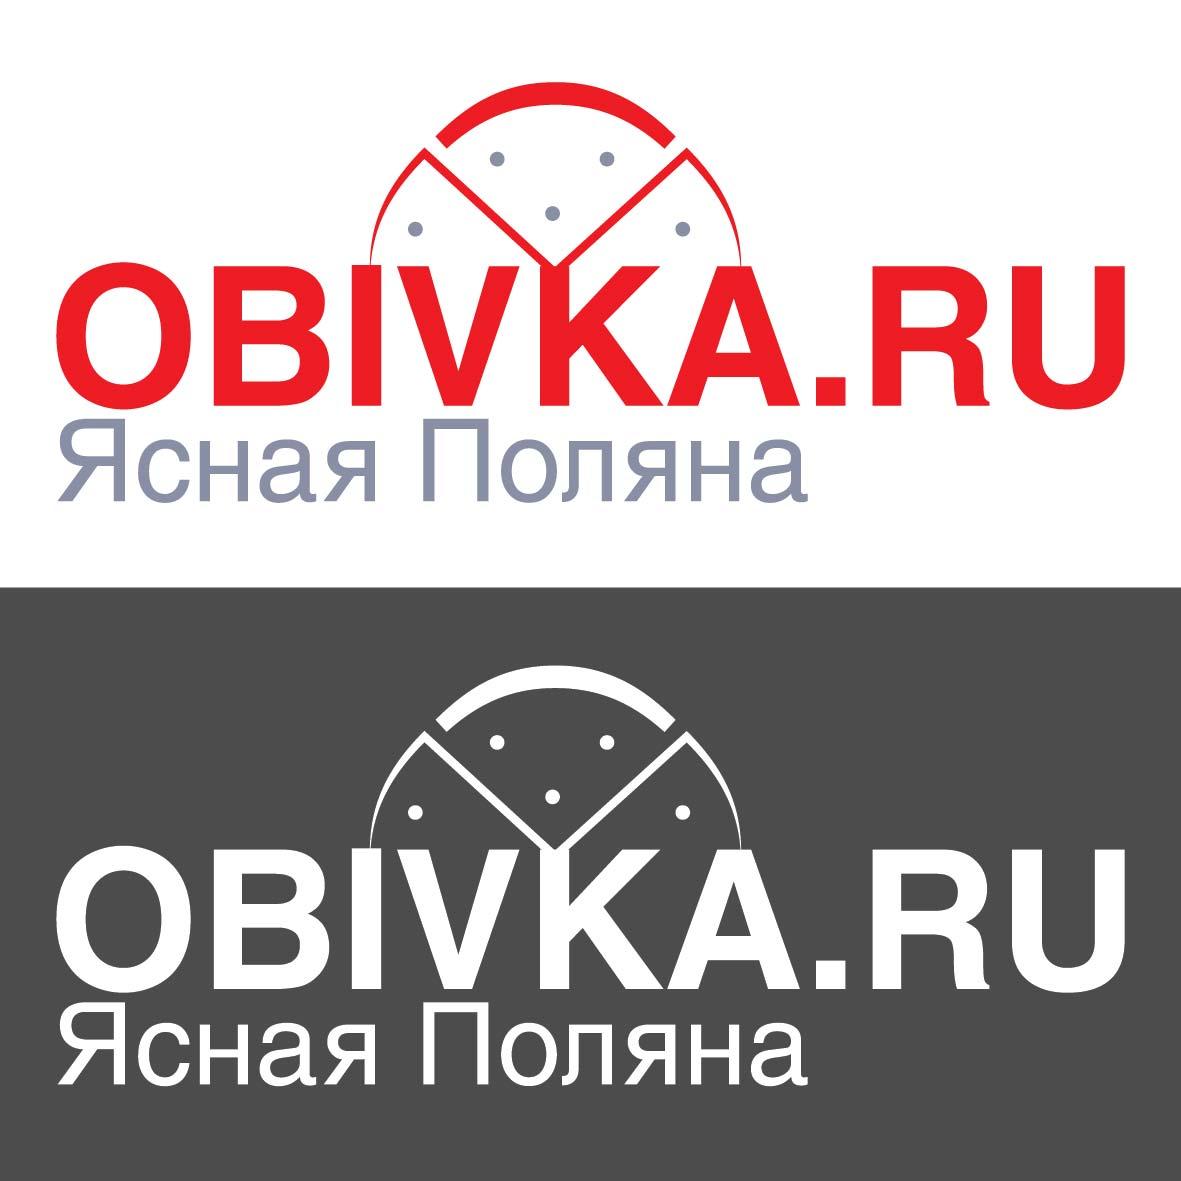 Логотип для сайта OBIVKA.RU фото f_9325c10fdd2c00ee.jpg